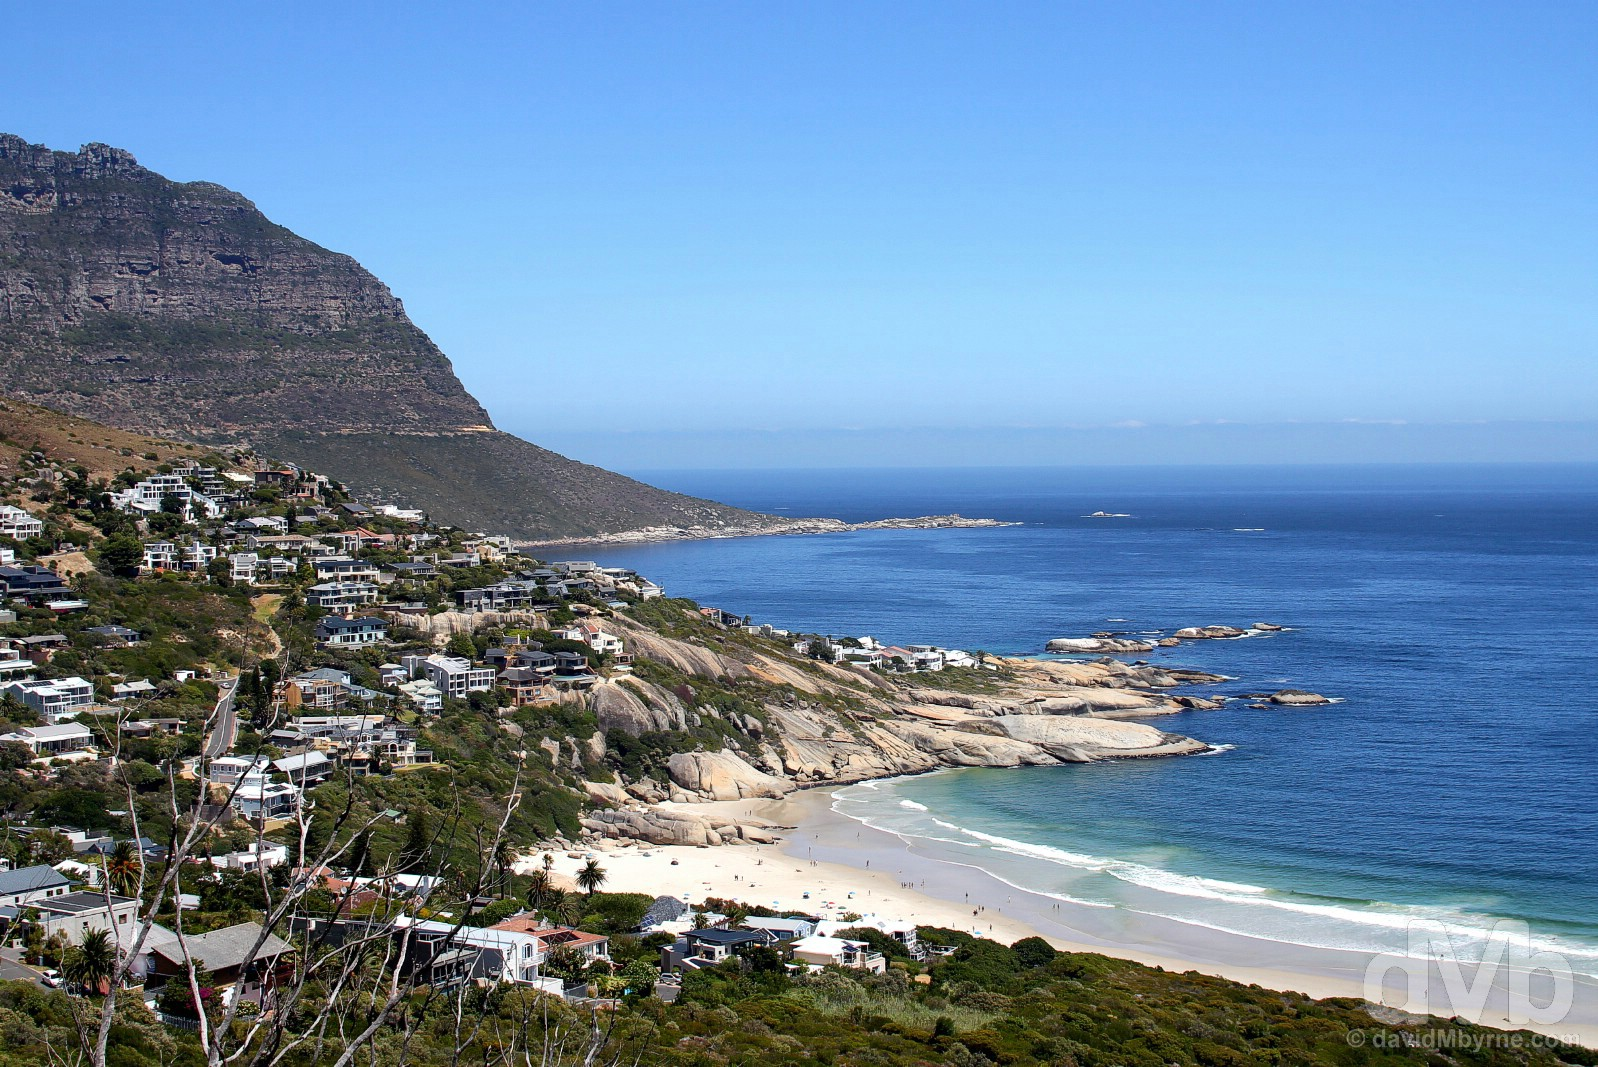 Llandudno from the coastal Victoria Road, Cape Peninsula, Western Cape, South Africa. February 17, 2017.